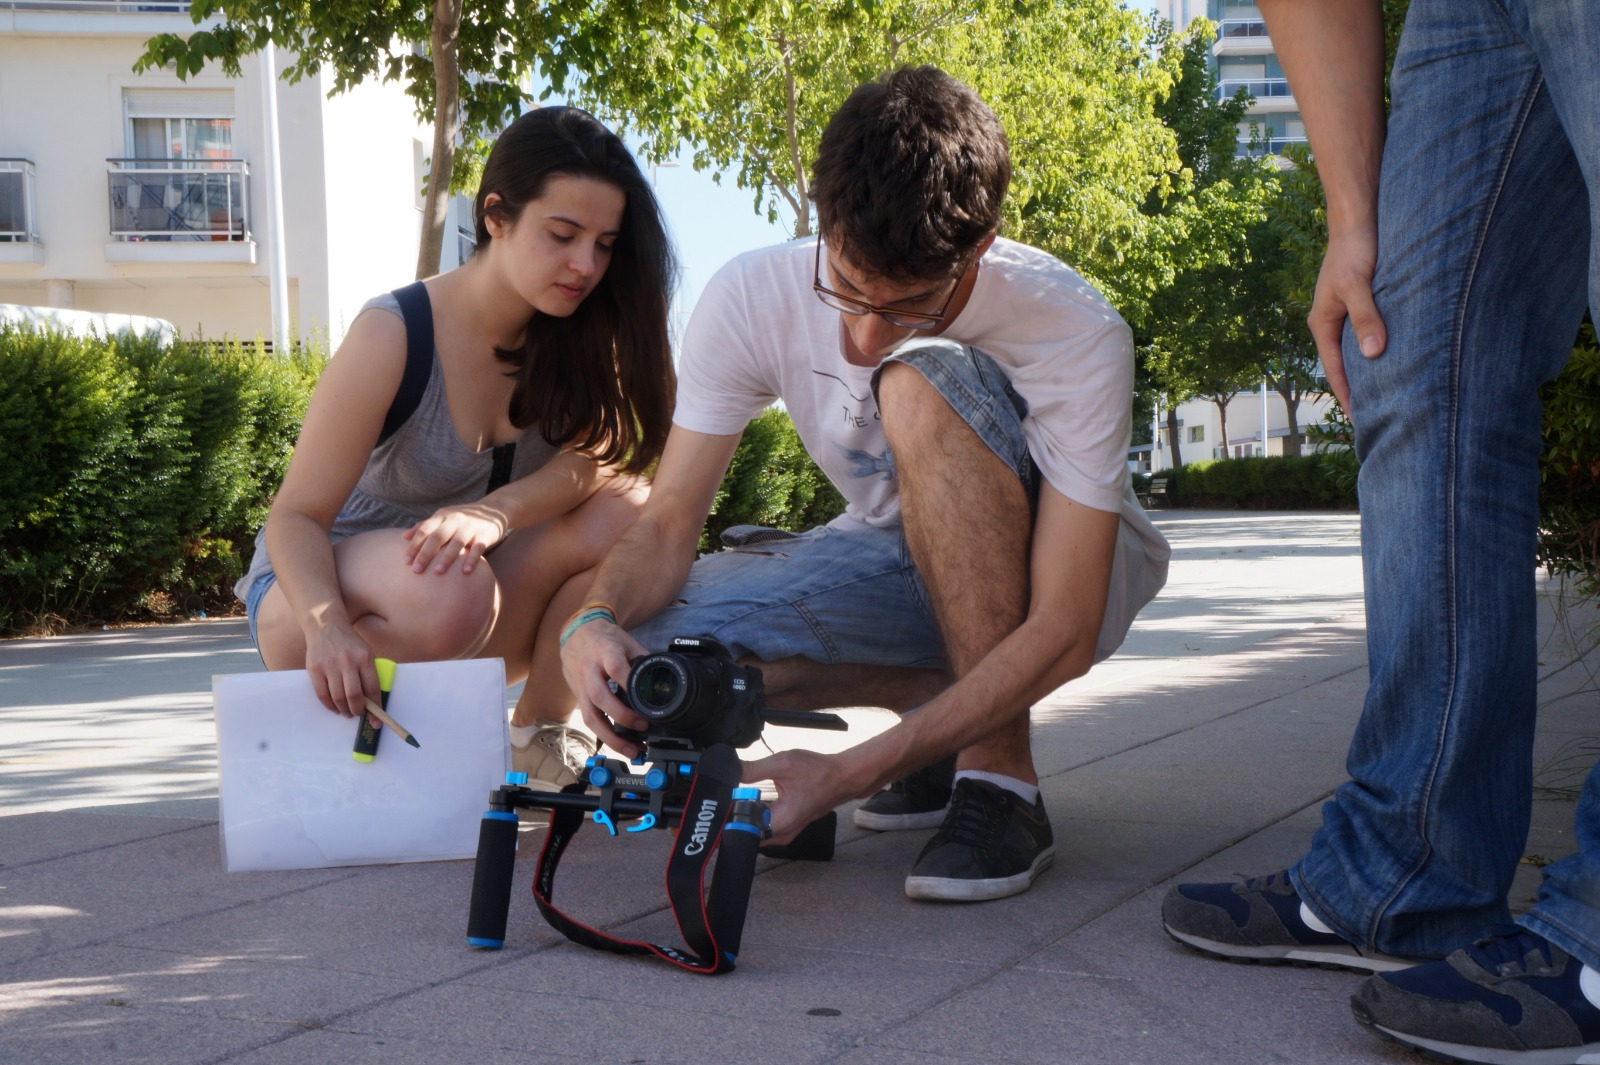 Lucía y Nacho en un moment de la gravació de la websèrie contra la violència de gènere, Retales Retales